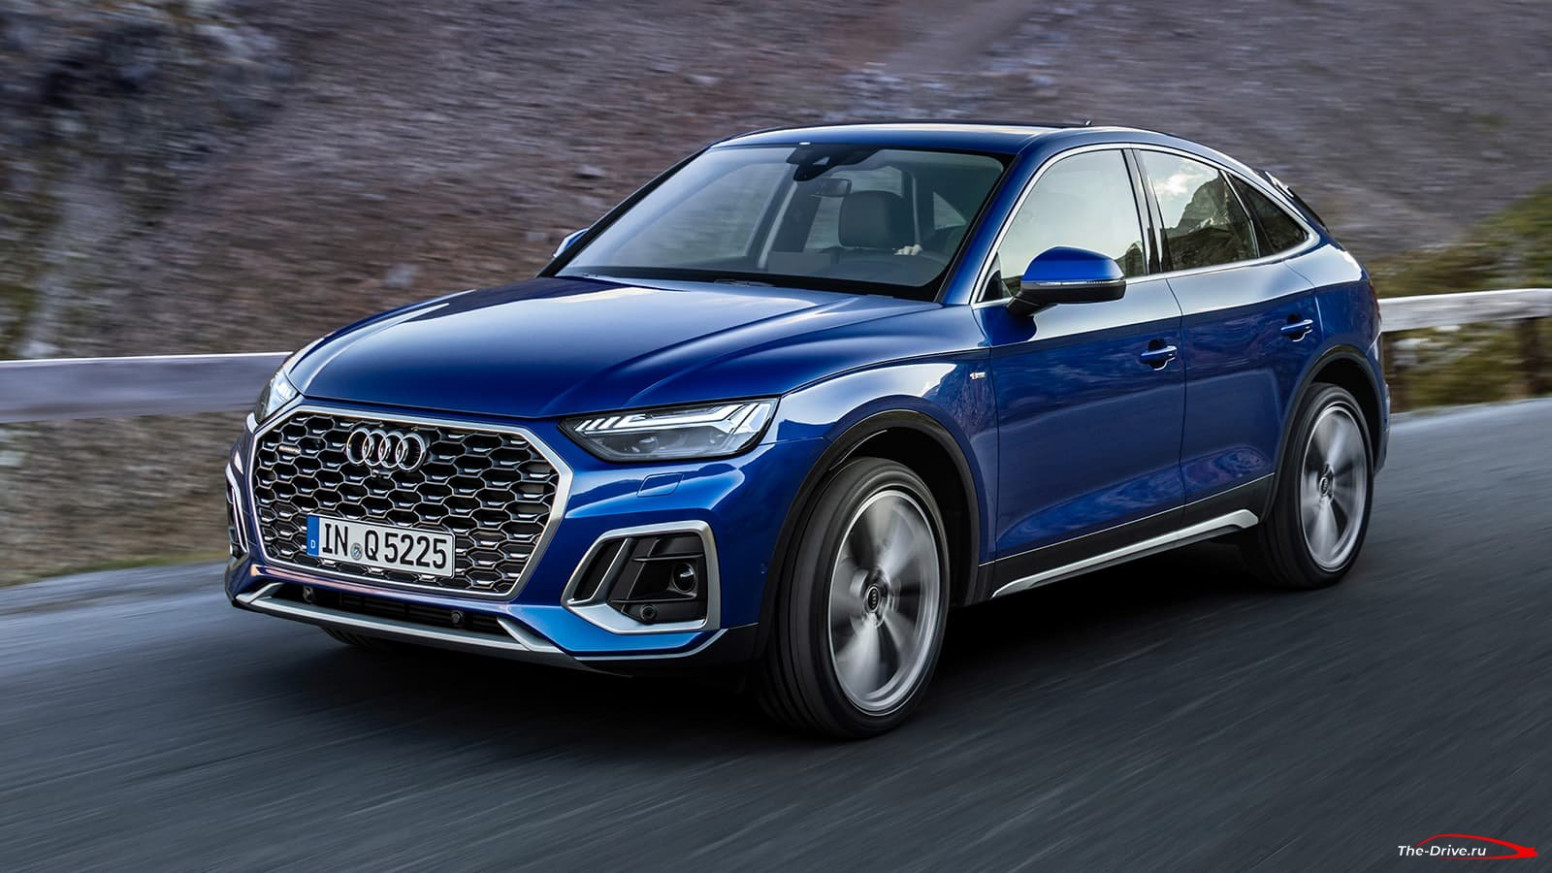 Pricing 2022 Audi Q5 Suv